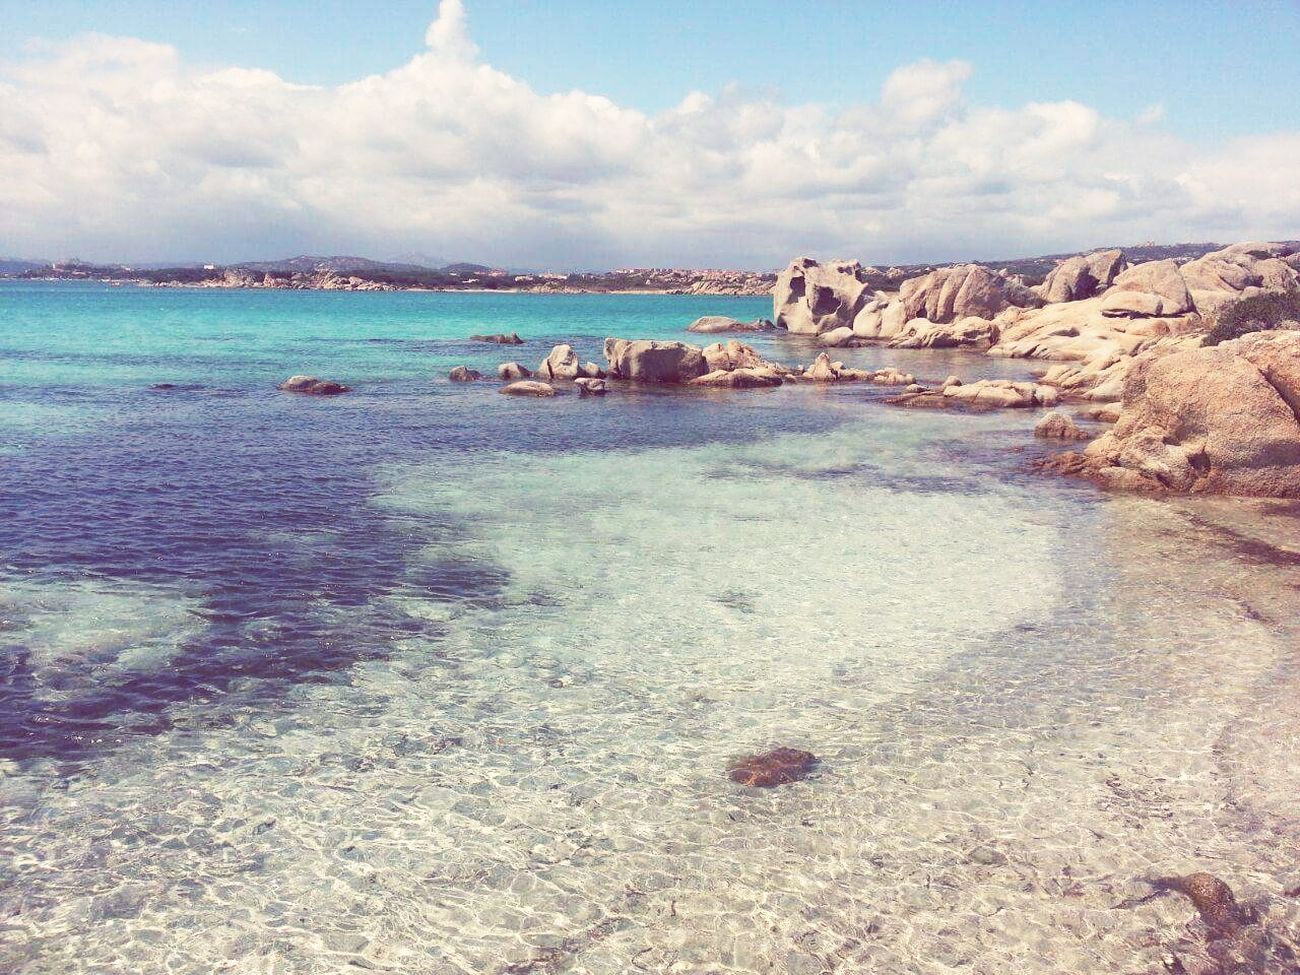 Lamaddalena Marenostrum Ricordi Maestrale Water Sea Beach Nature Day Sky